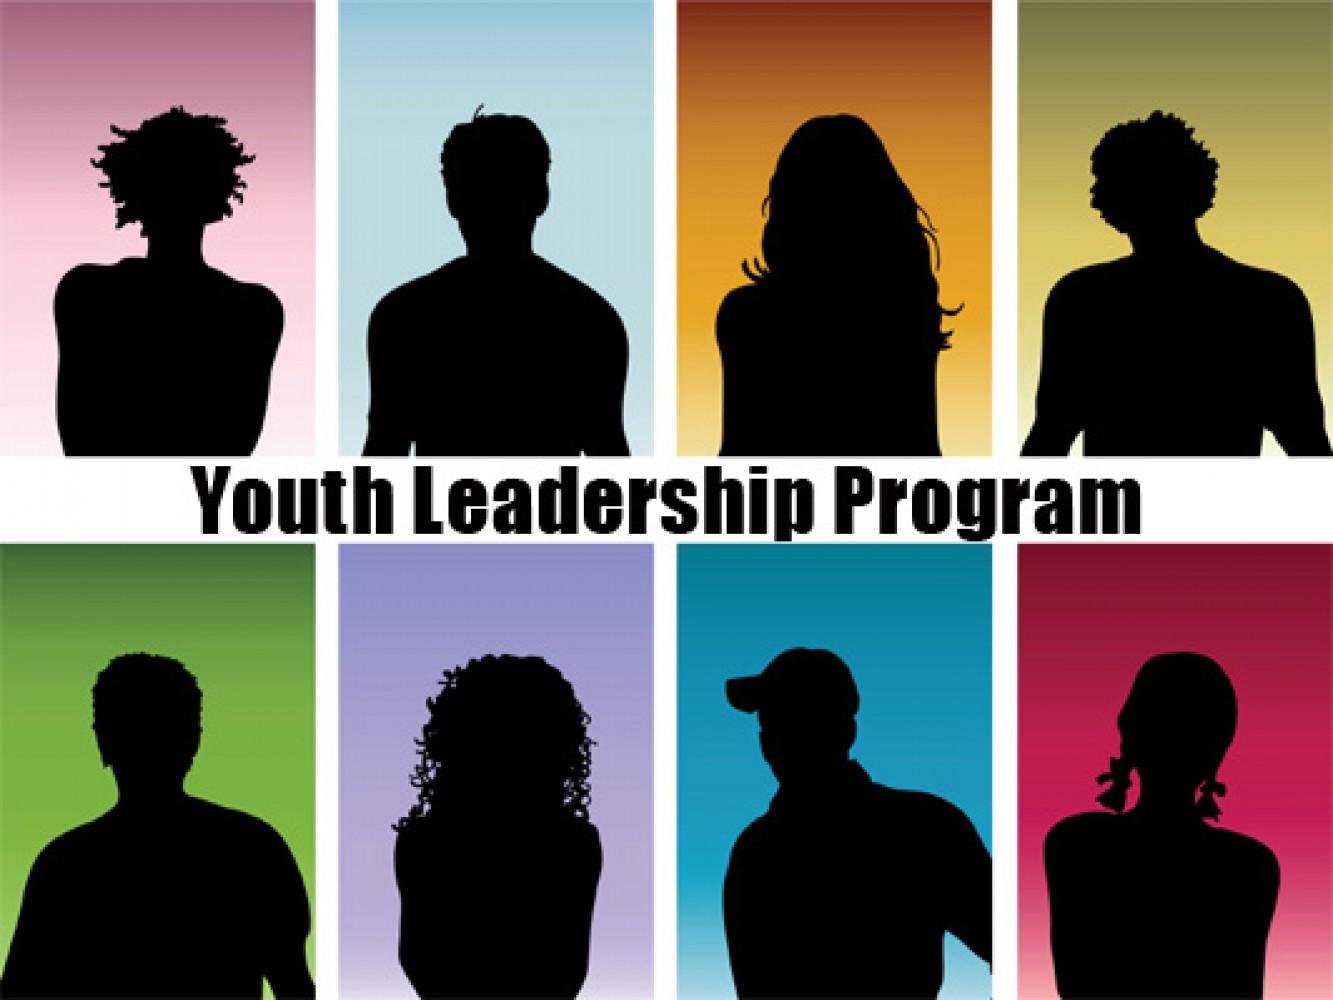 Youth Leadership Program - Toastmaster